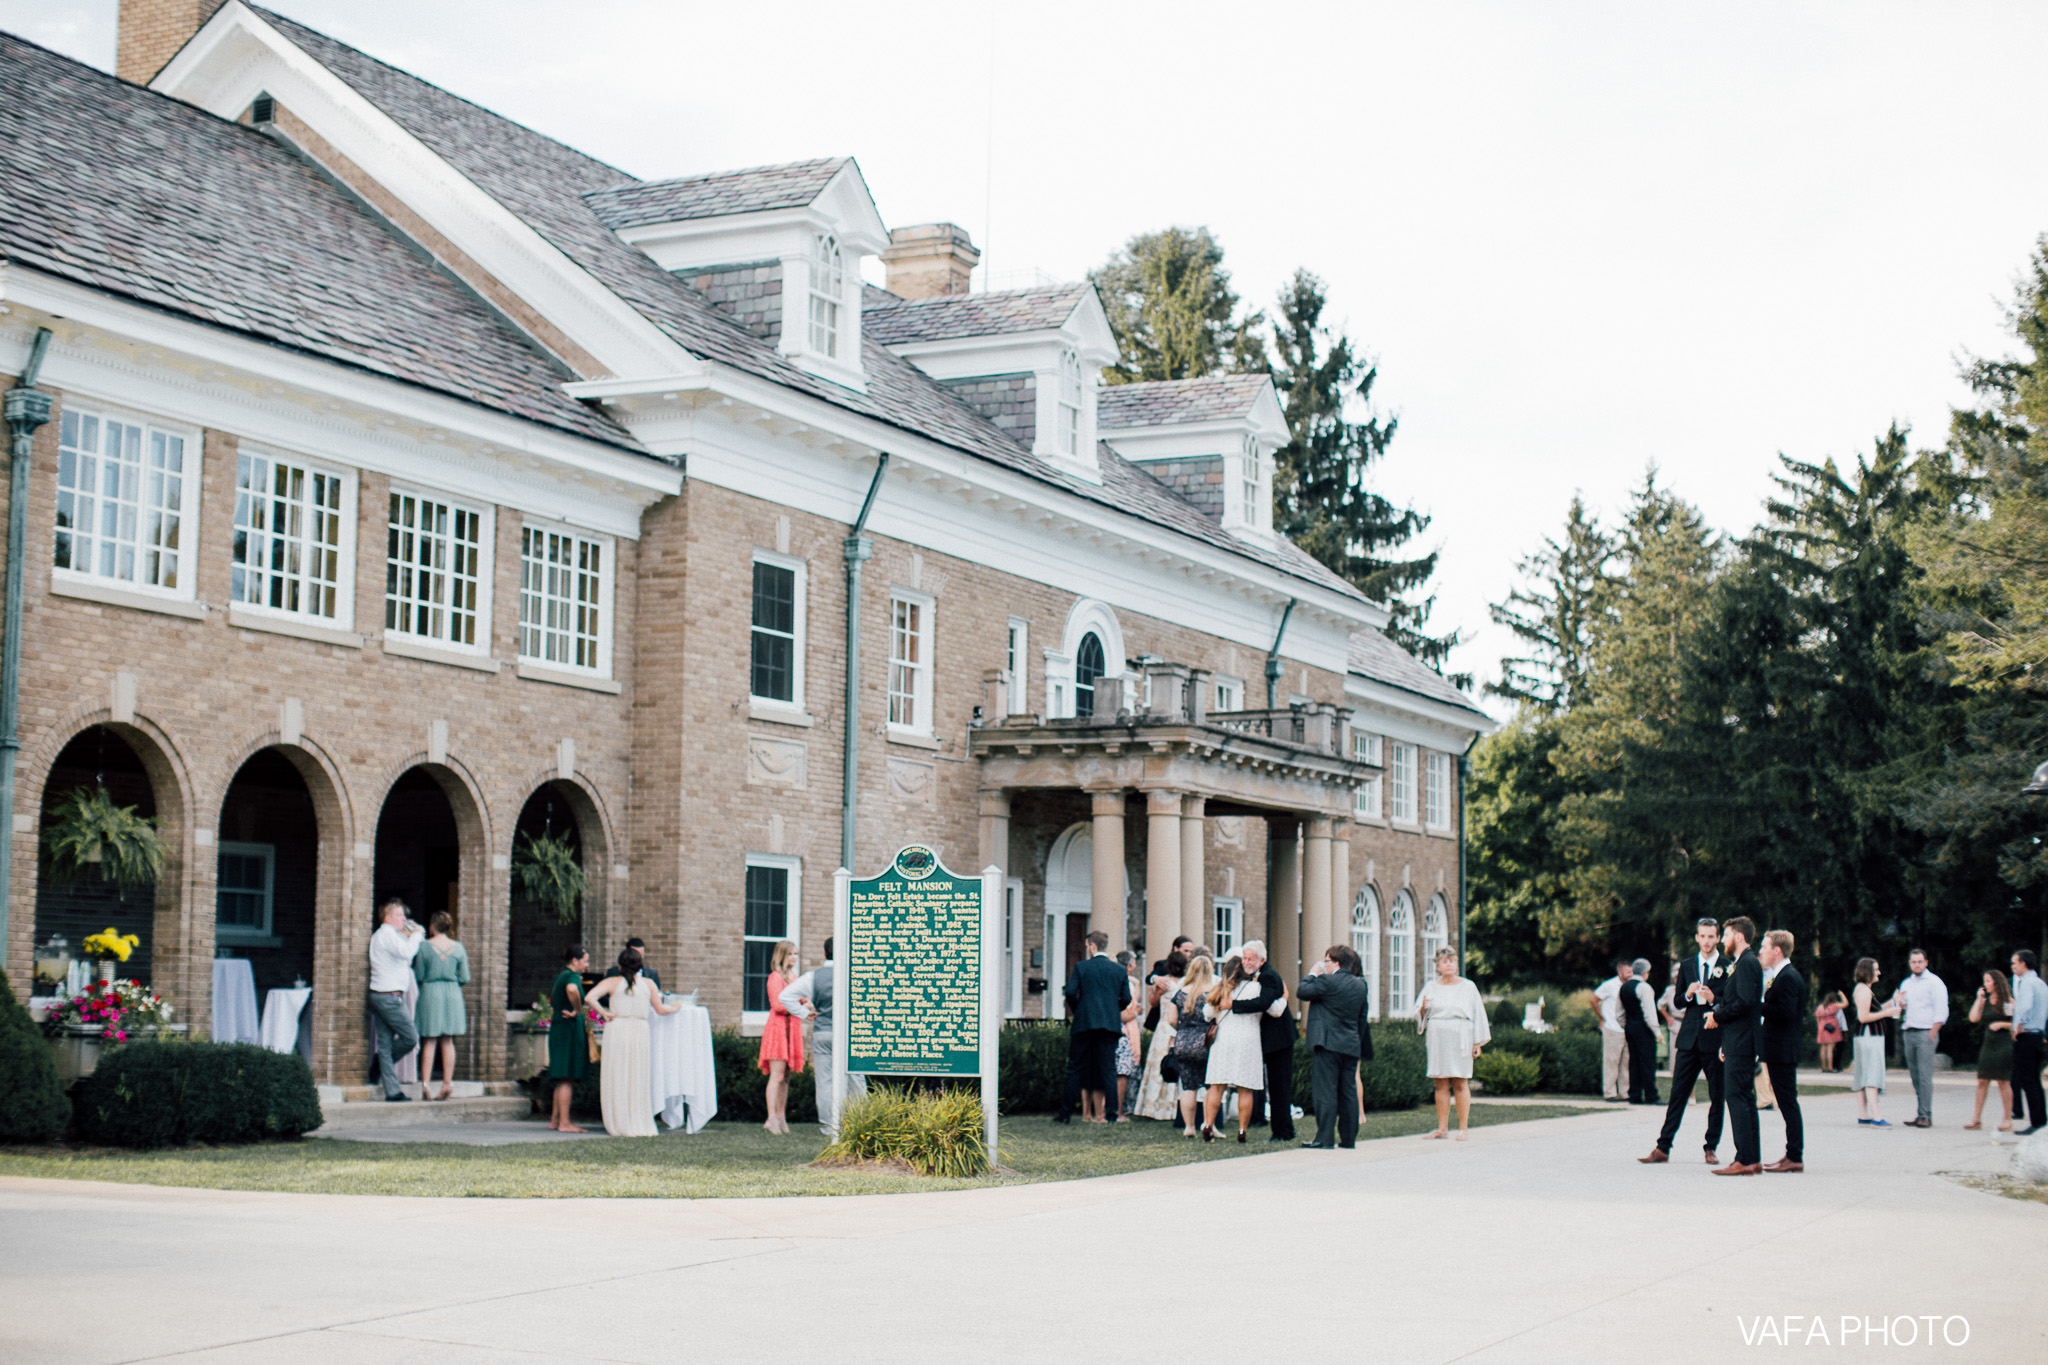 The-Felt-Estate-Wedding-Kailie-David-Vafa-Photo-873.jpg